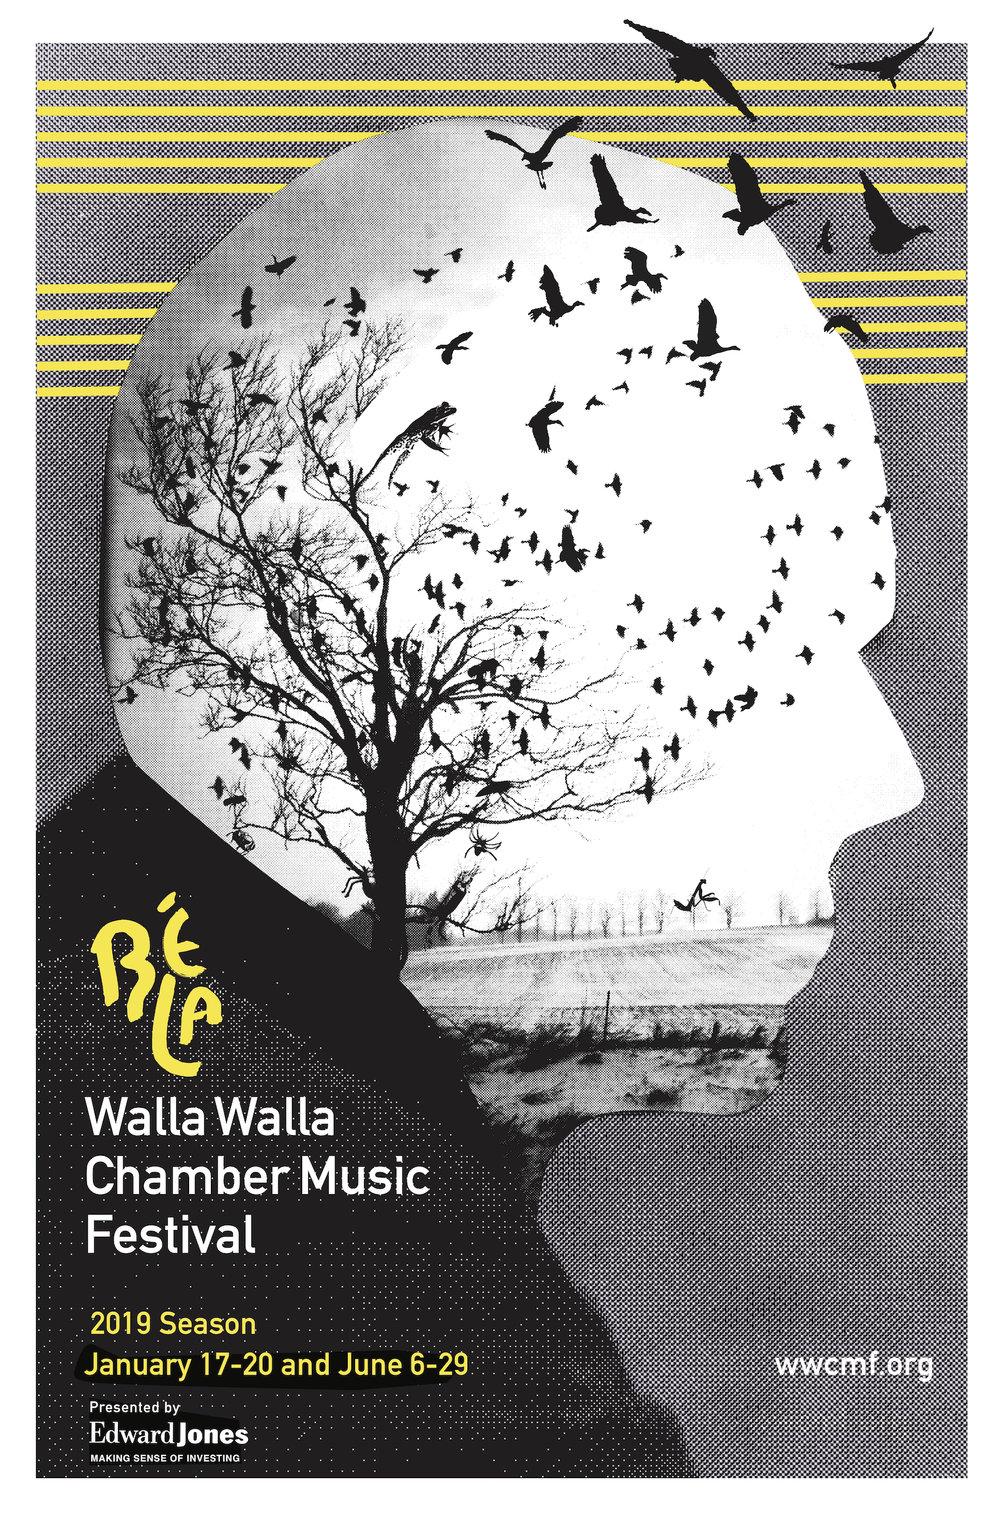 2019_January_WWCMF_Poster.jpg